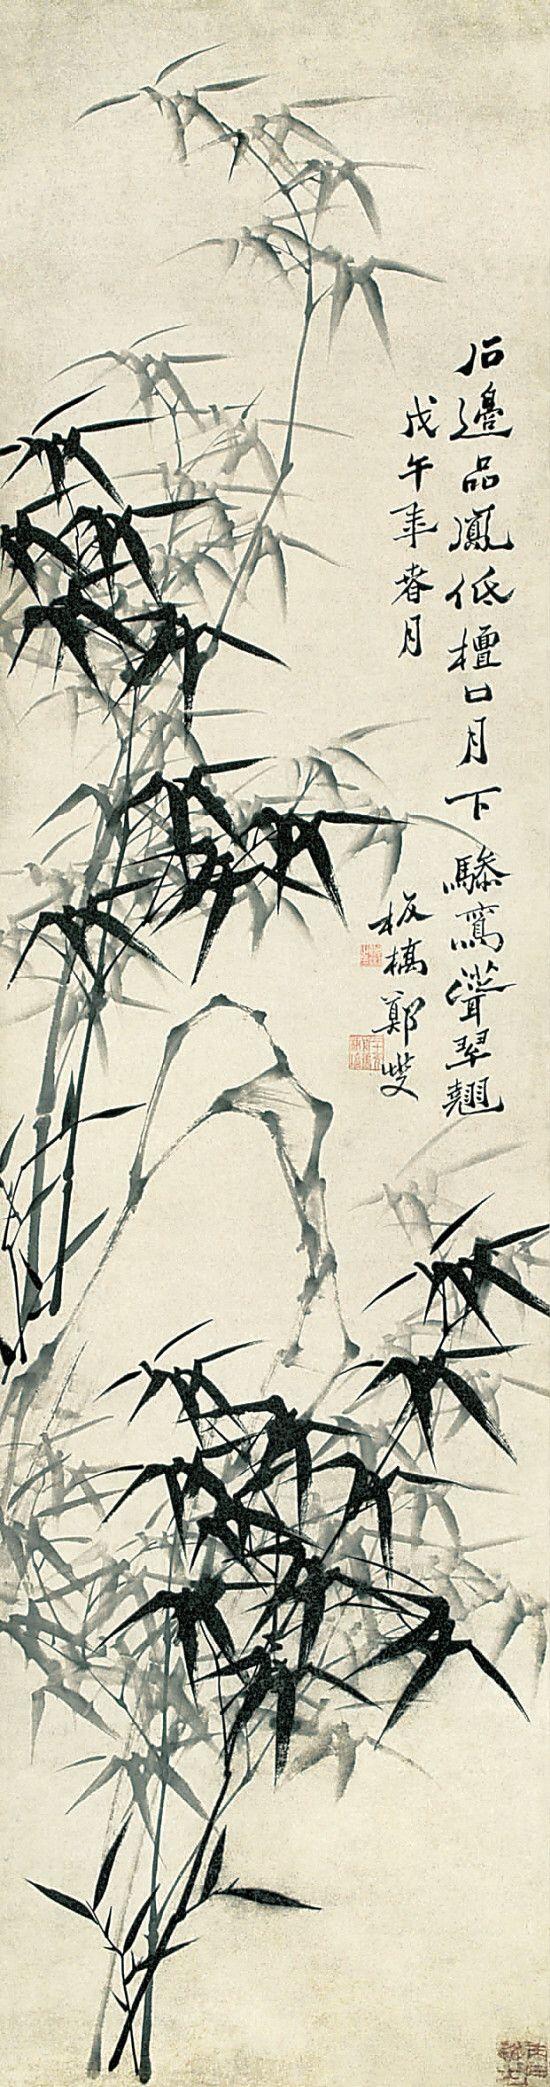 清代 - 鄭燮 - 竹石圖          Zheng Xie (1693–1765), commonly known as Zheng Banqiao (鄭板橋) was a Chinese painter from Jiangsu.